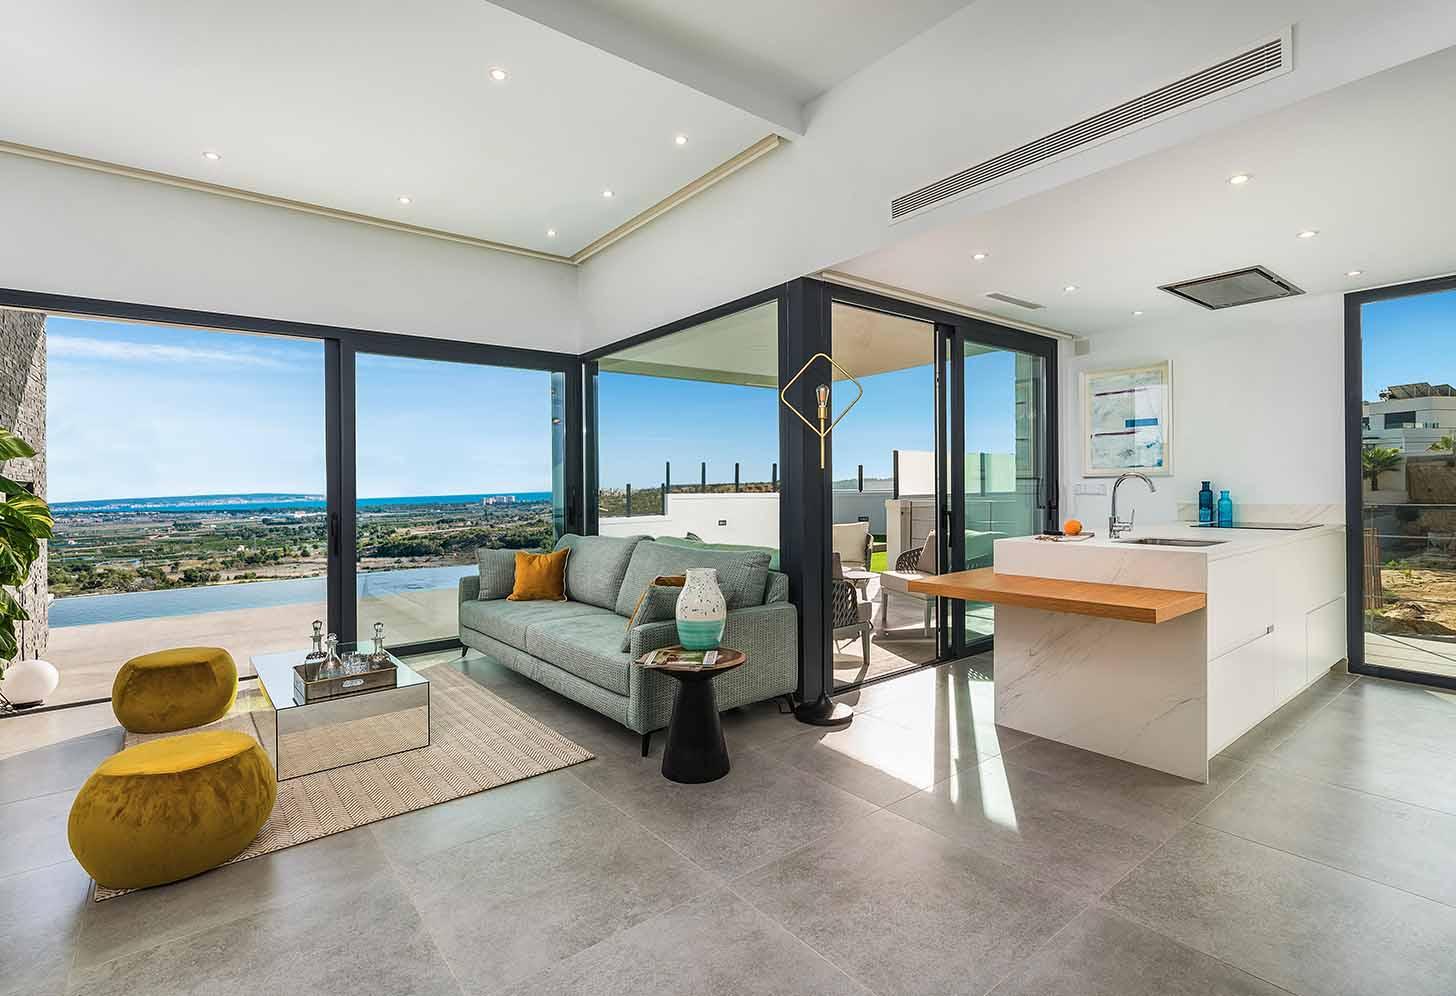 immobilier neuf espagne costa blanca sud alicante rojales salon